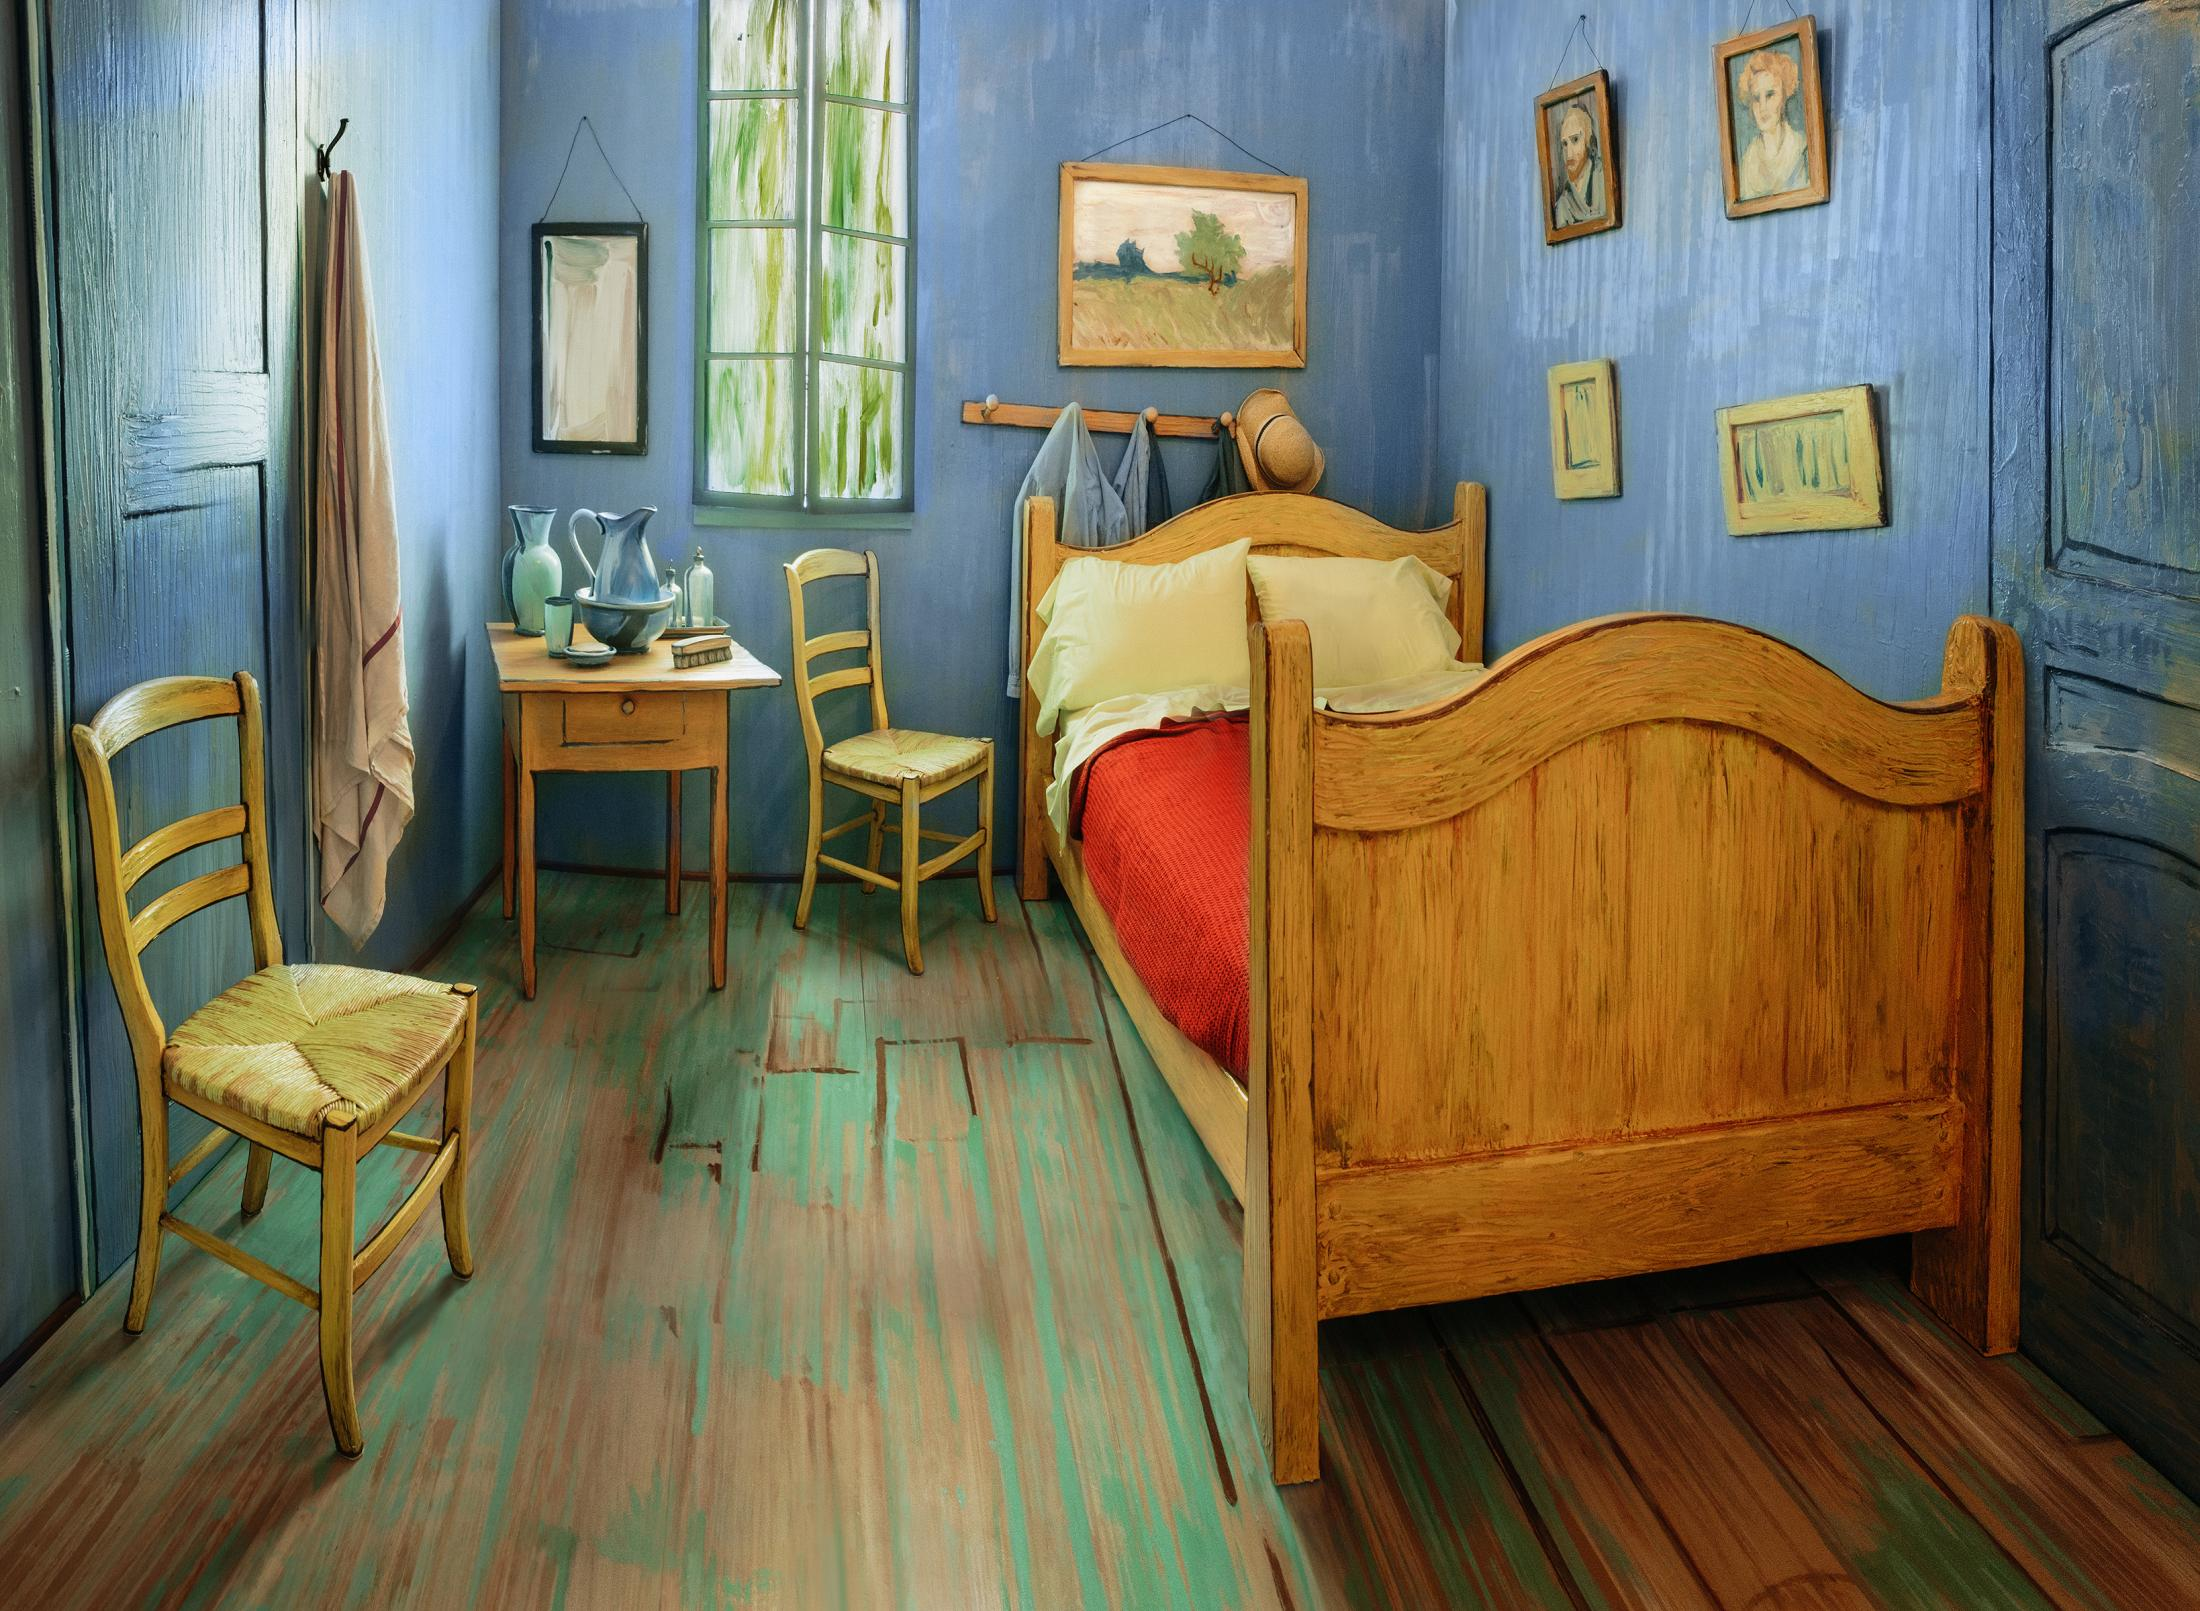 Thumbnail for Van Gogh BnB